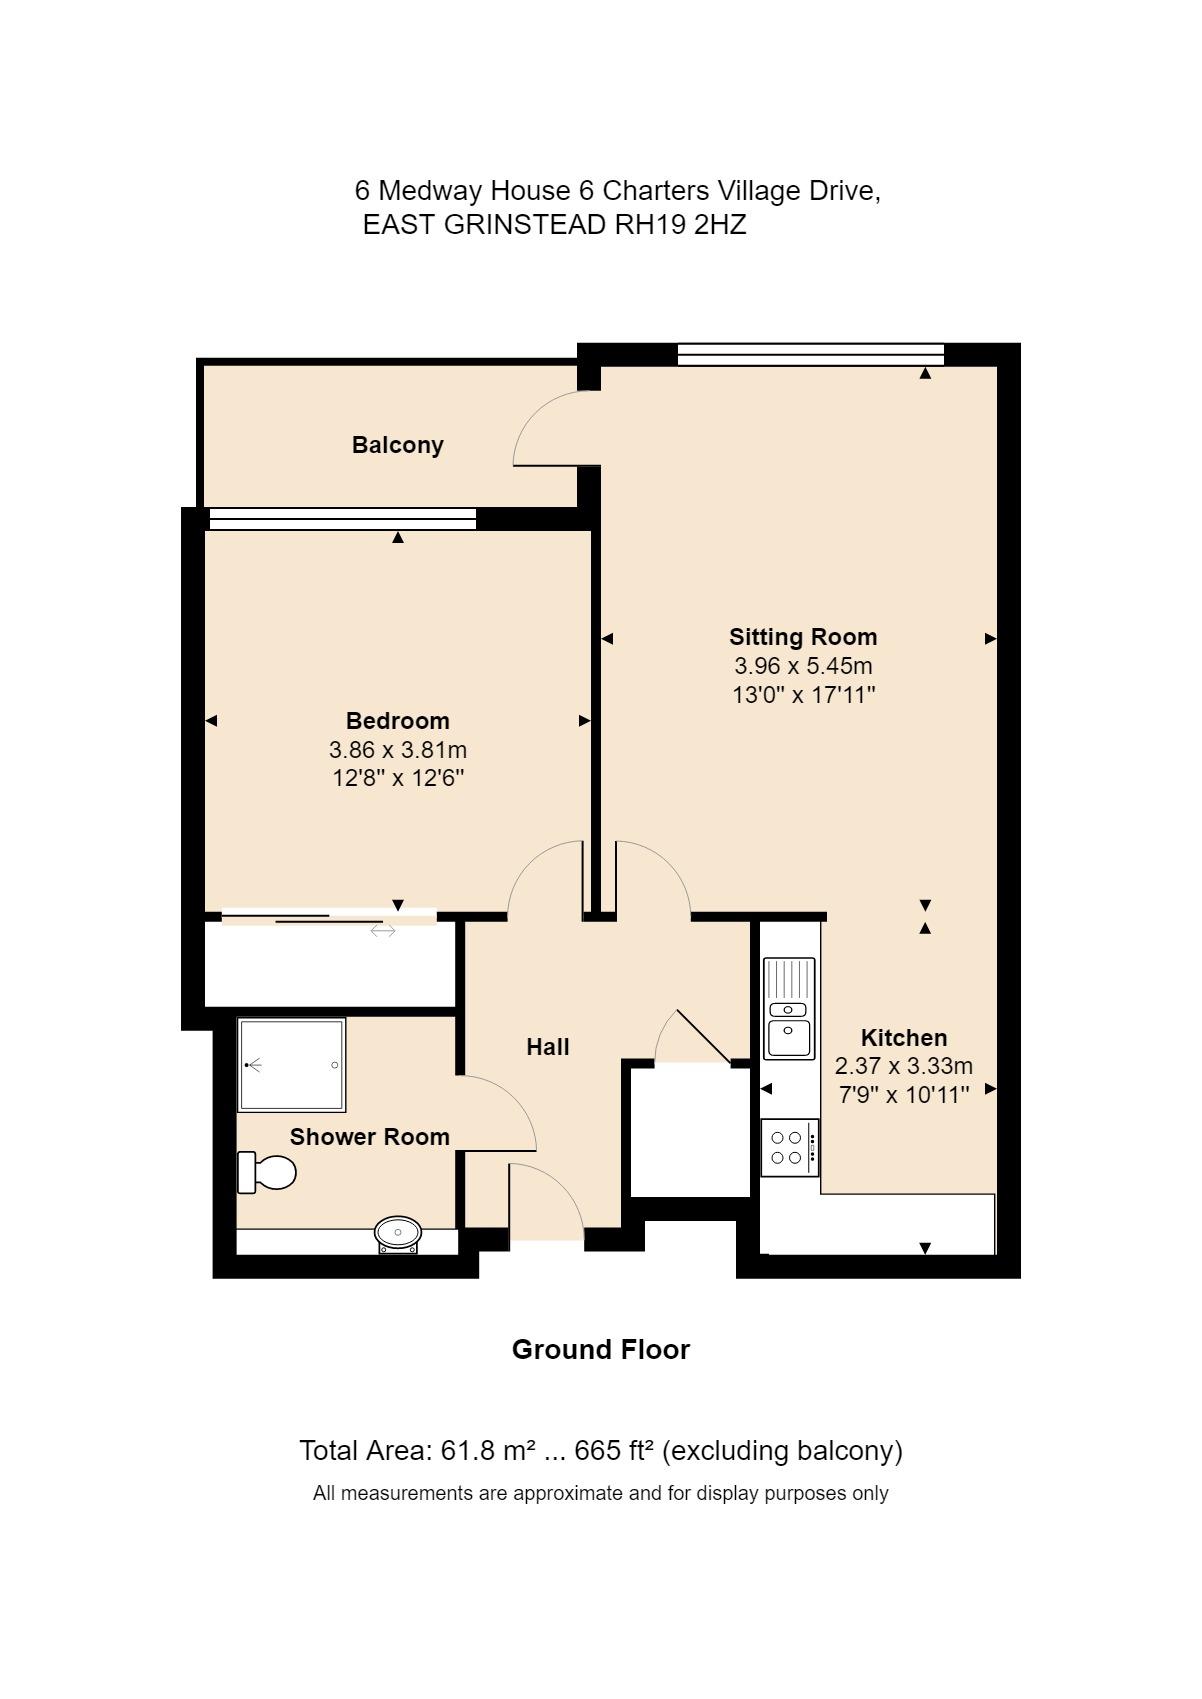 6 Medway House Floorplan